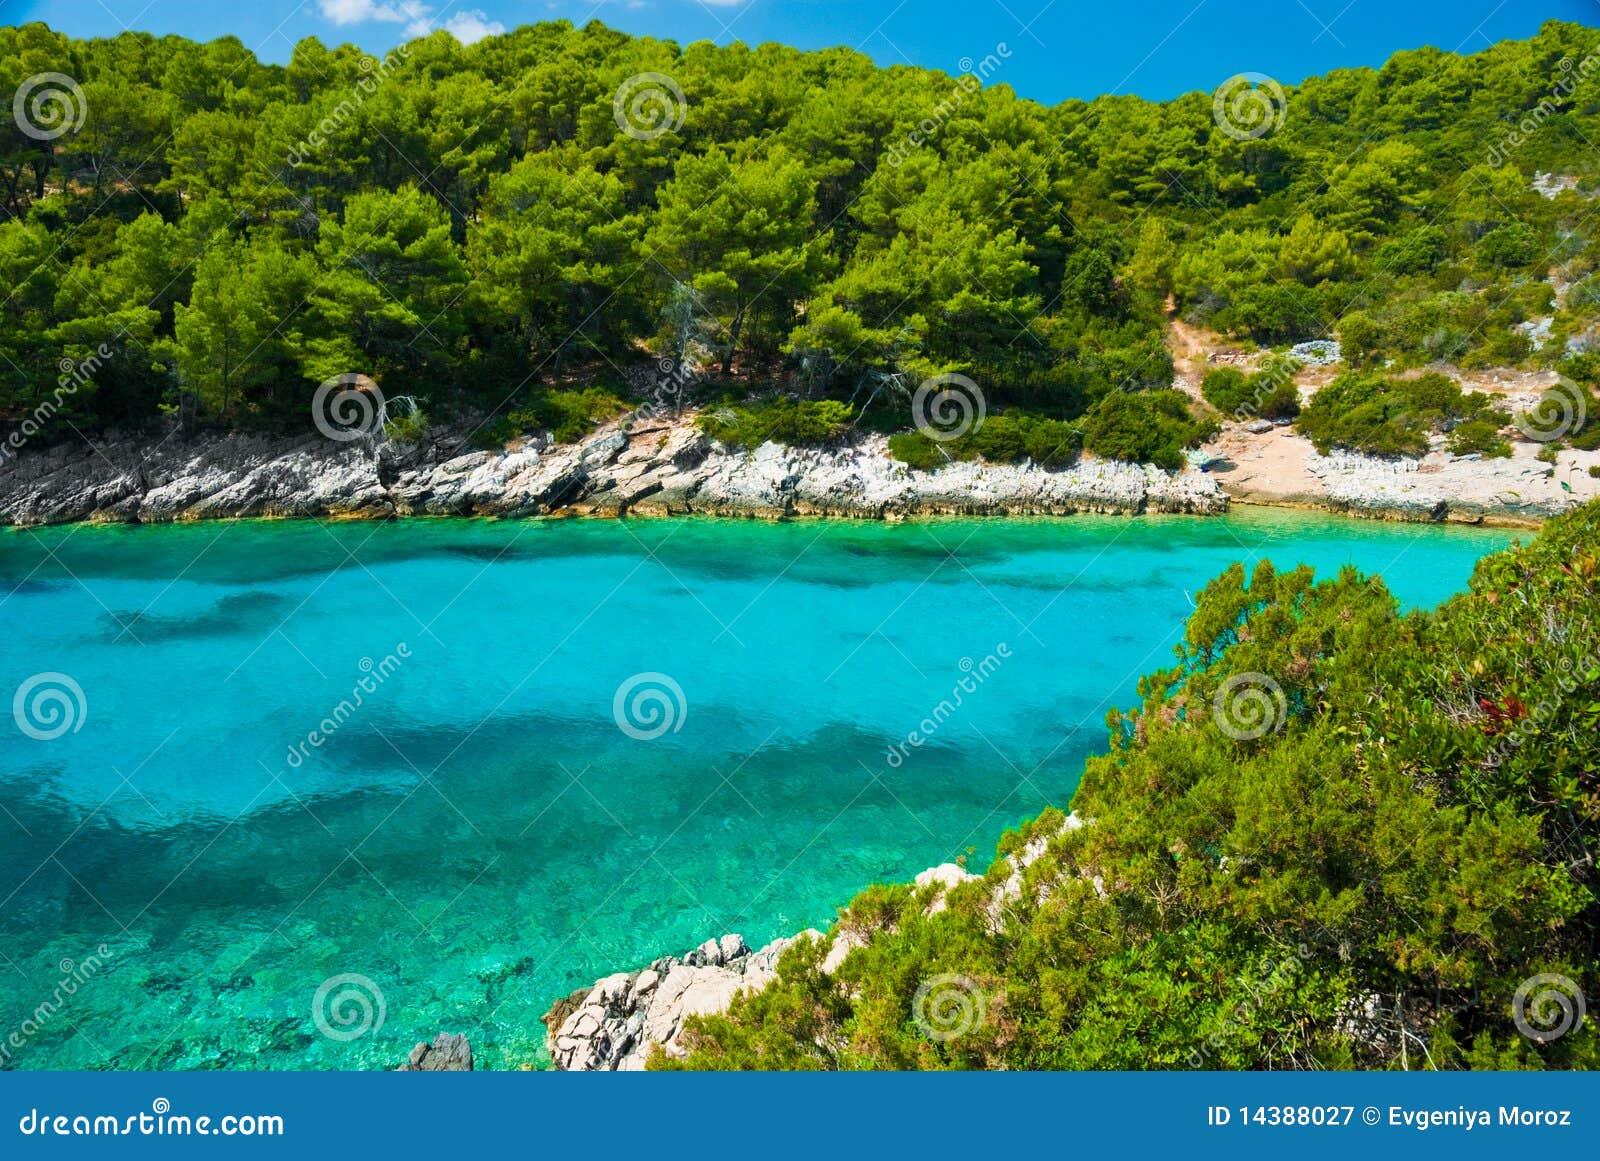 blaue lagune im adriatischen meer stockbild bild 14388027. Black Bedroom Furniture Sets. Home Design Ideas